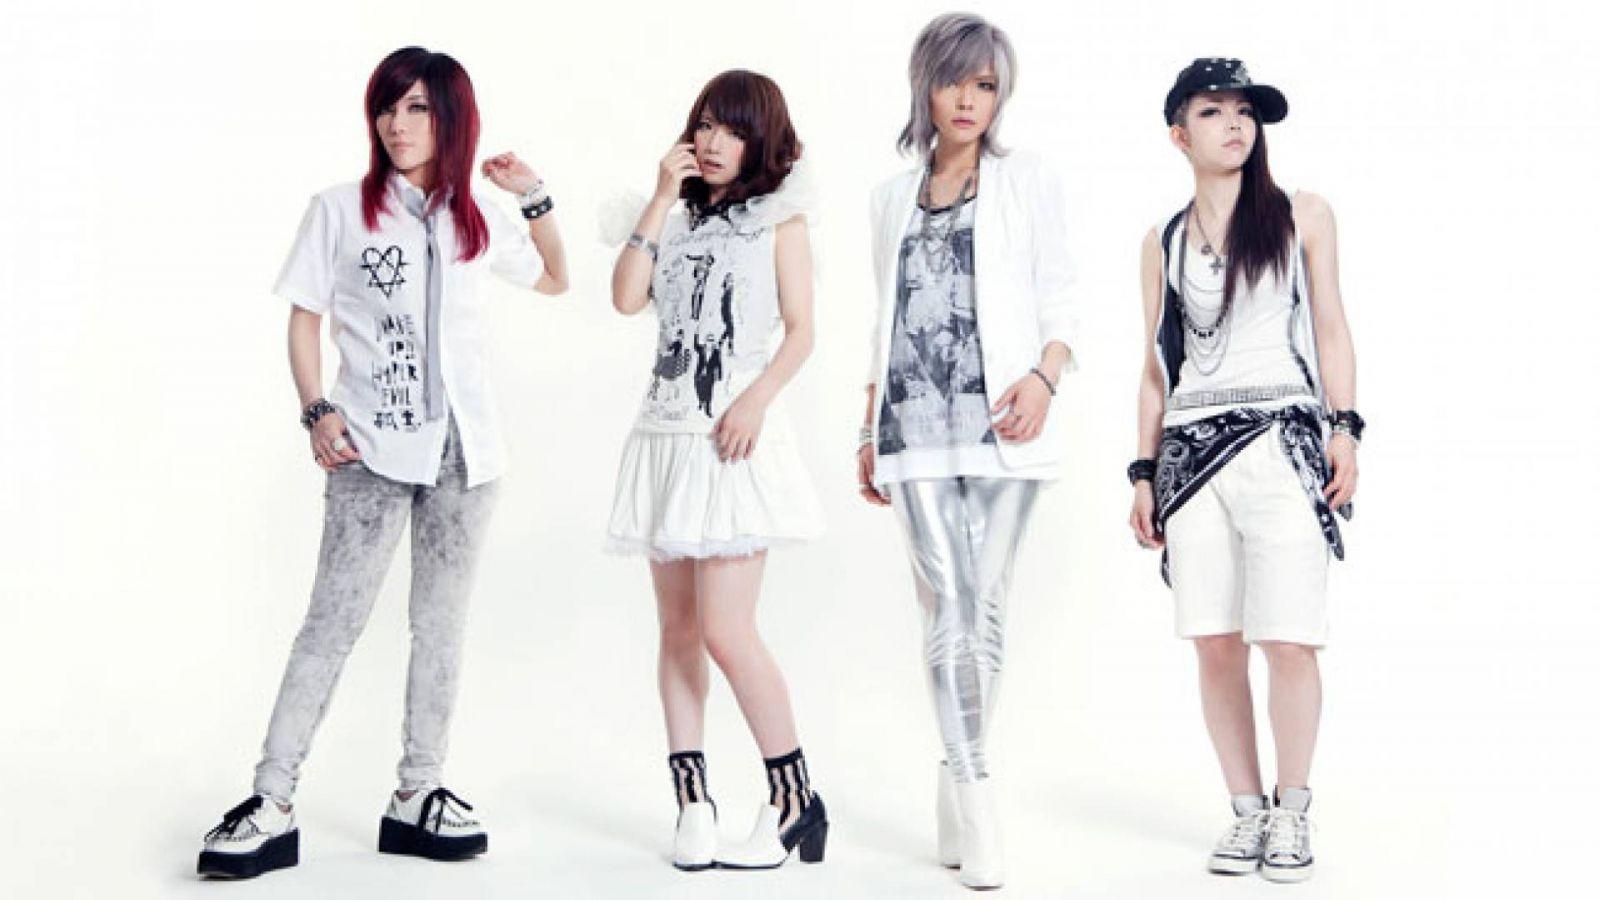 Detalhes do novo single do GANGLION © Mahito Takahashi